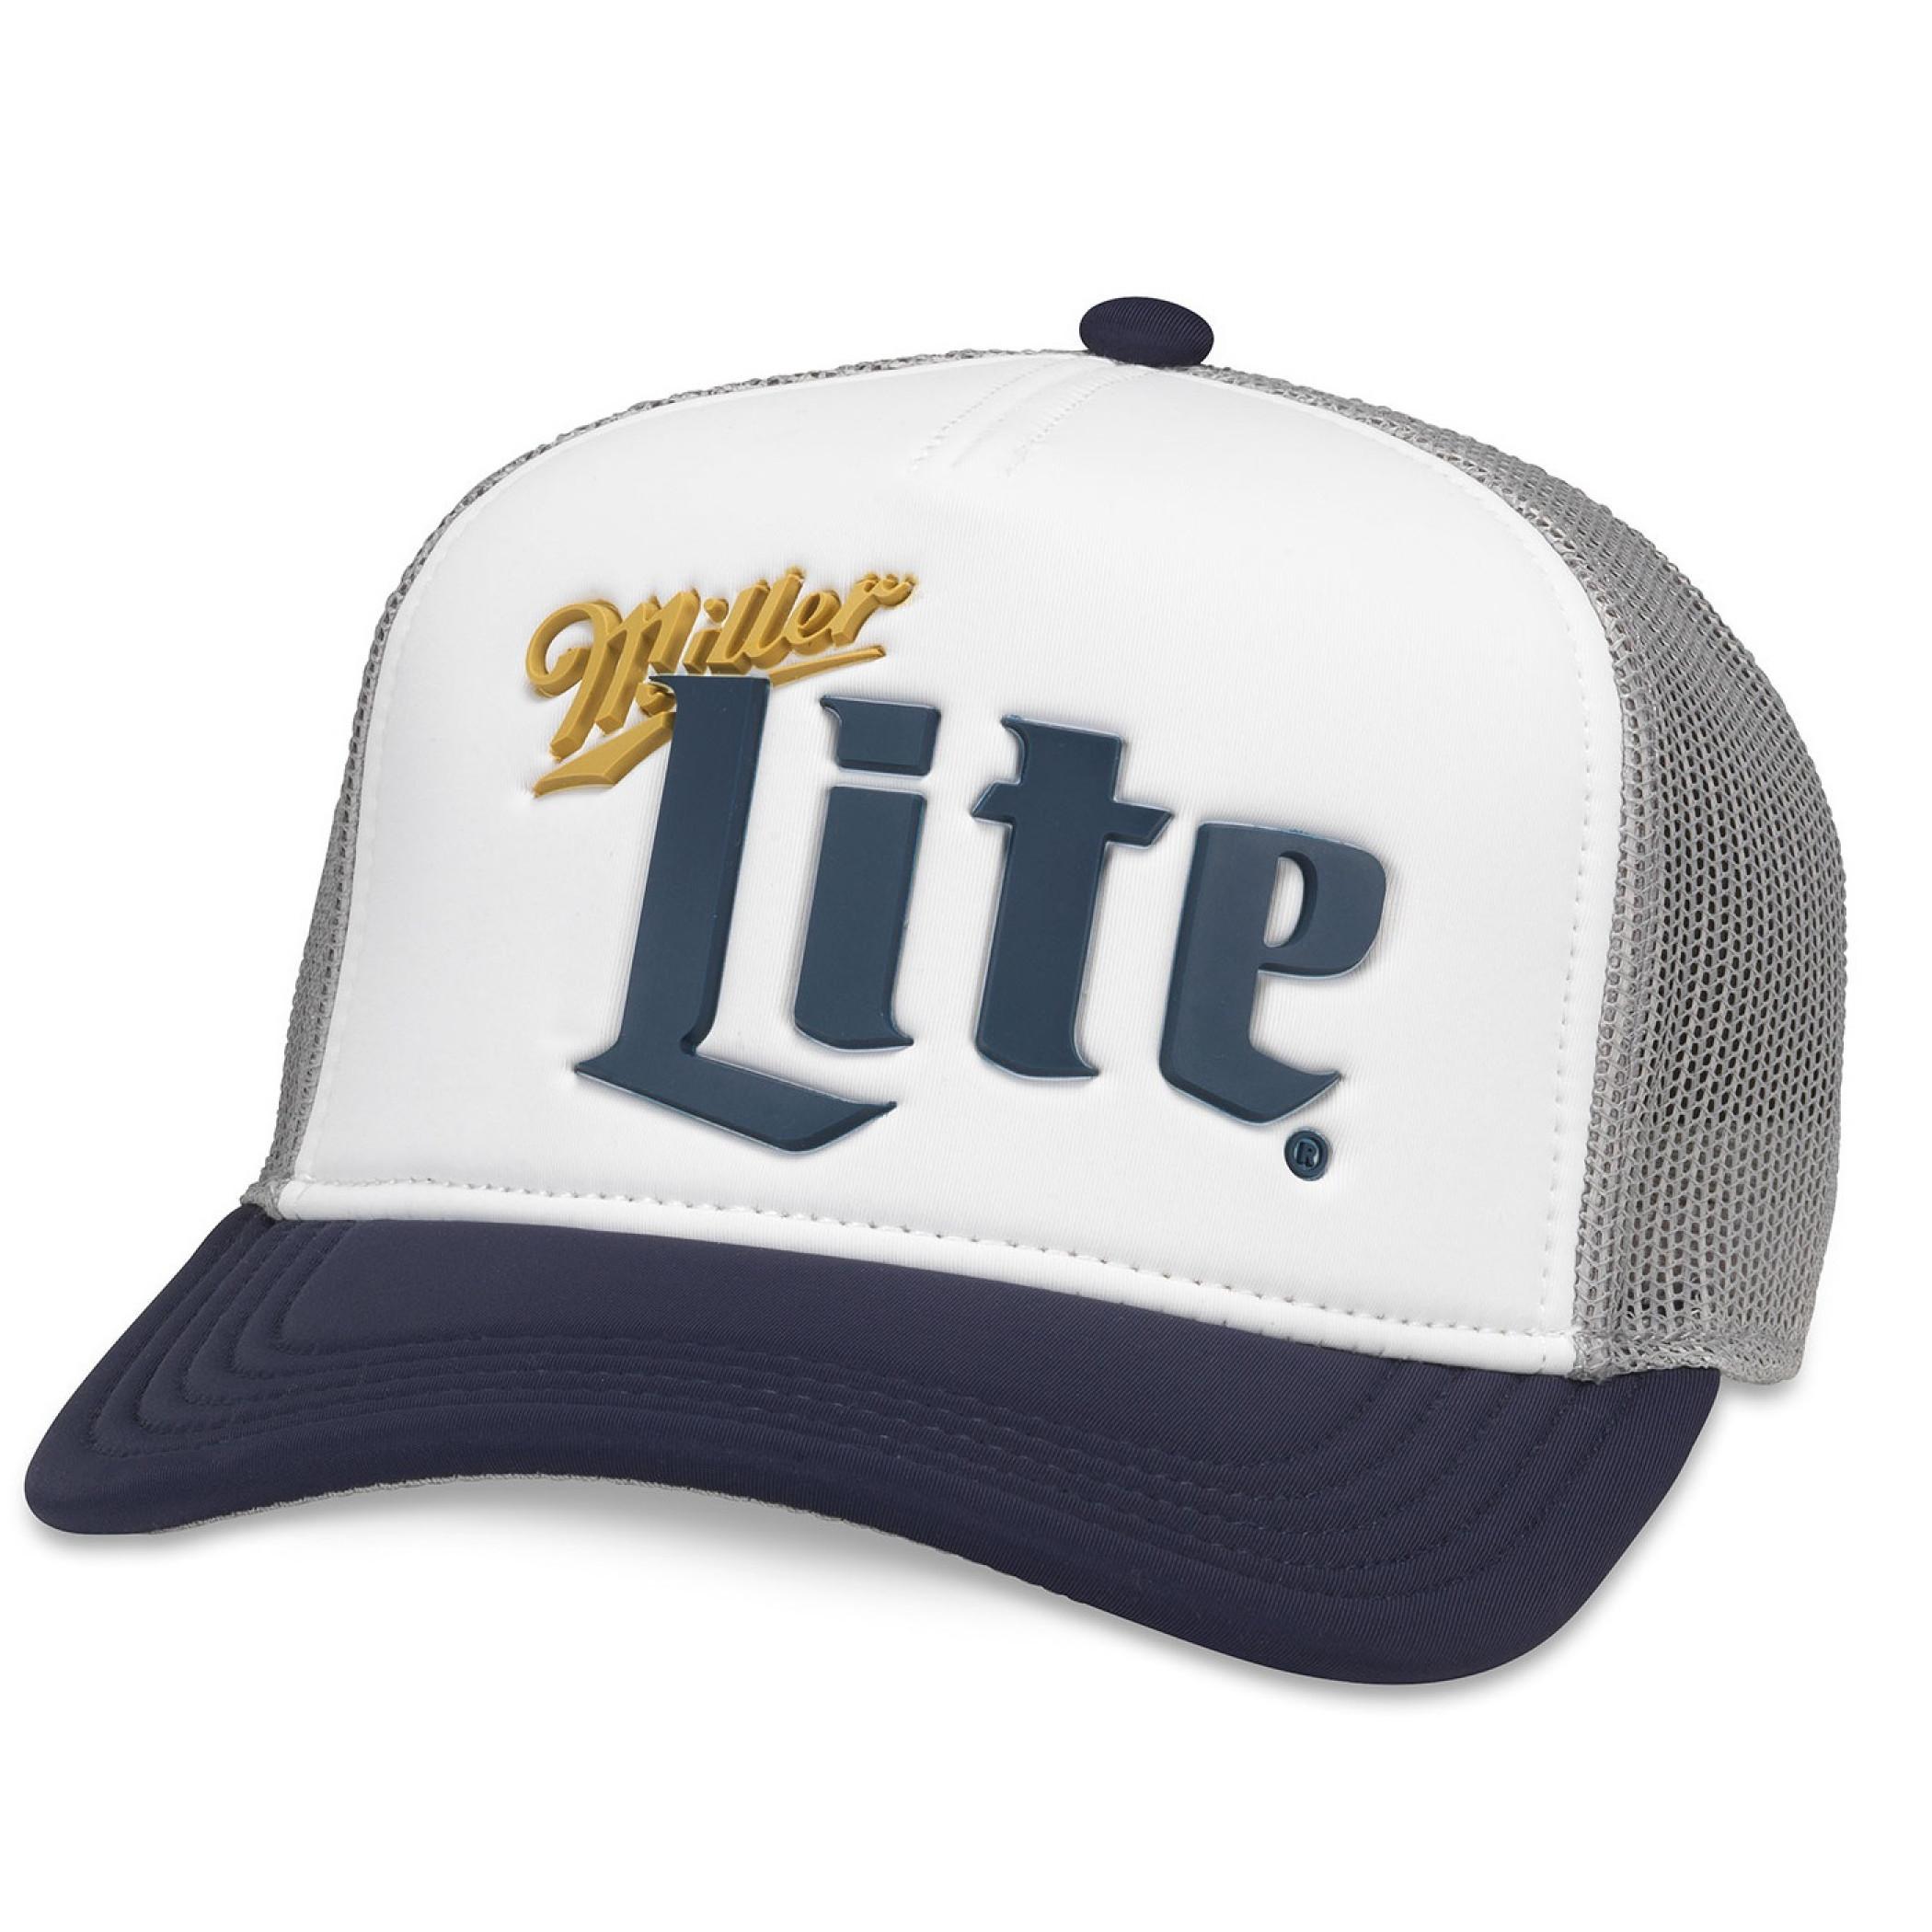 Miller Lite Beer Vintage Trucker Hat